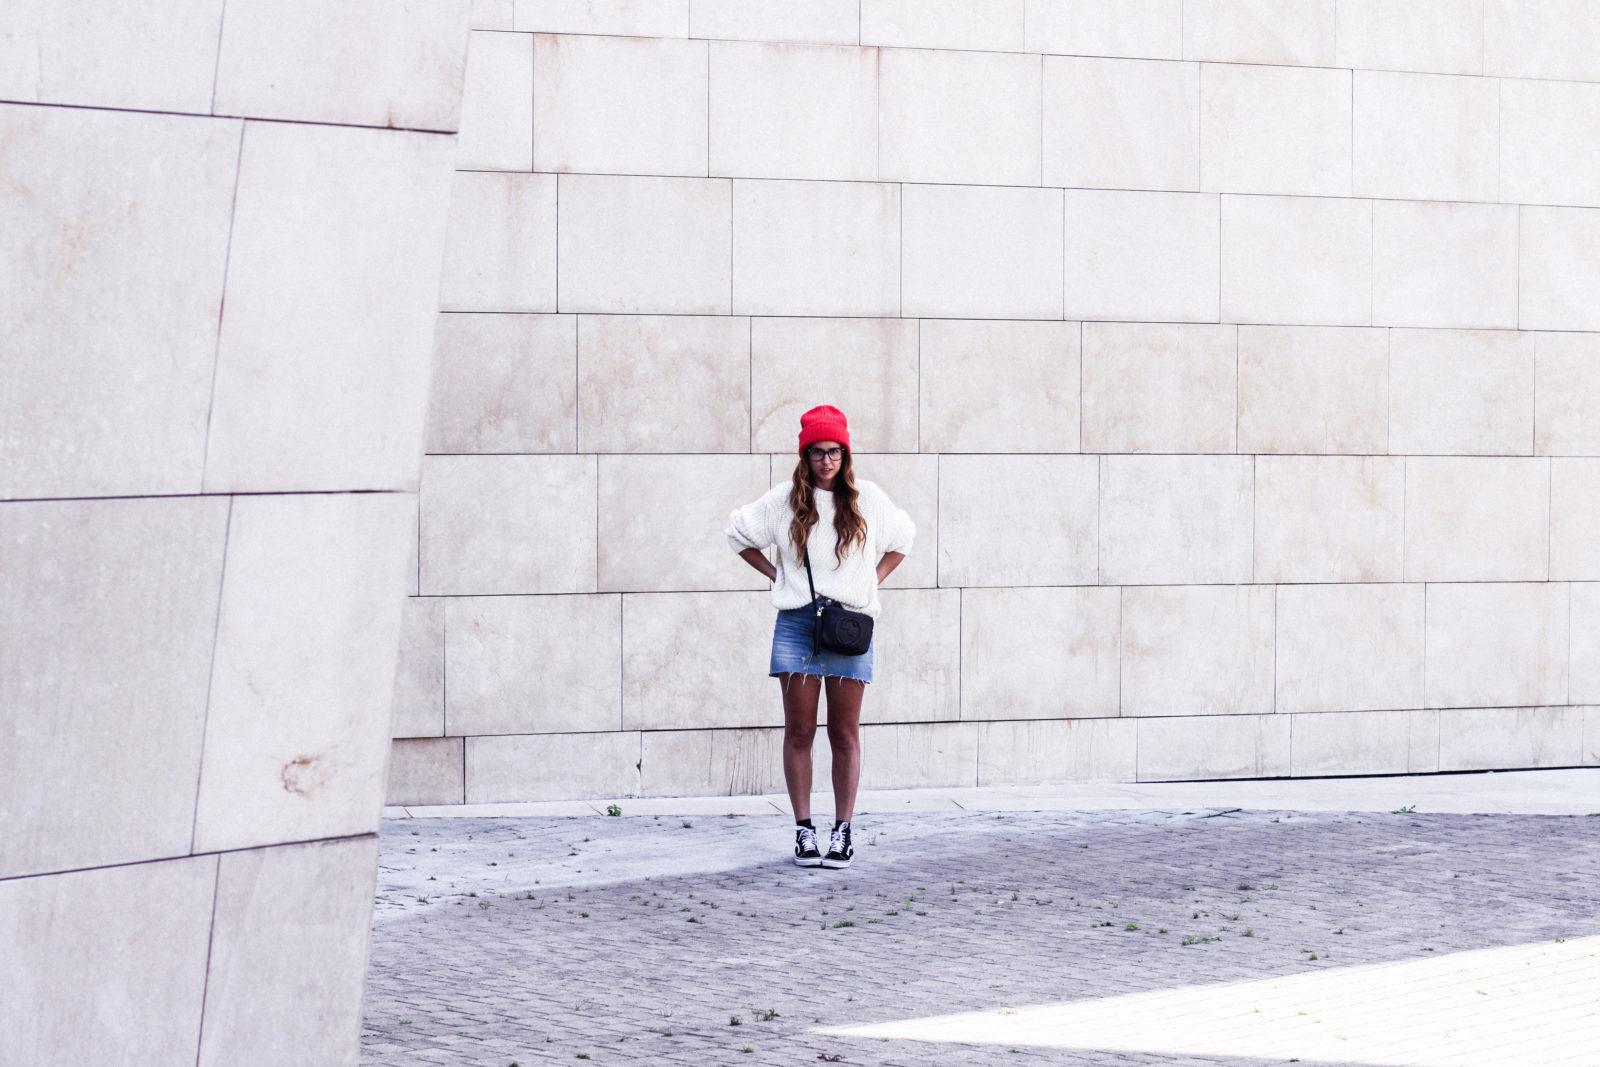 vans_falda_vaquera_sweater_beanie_bilbao-22